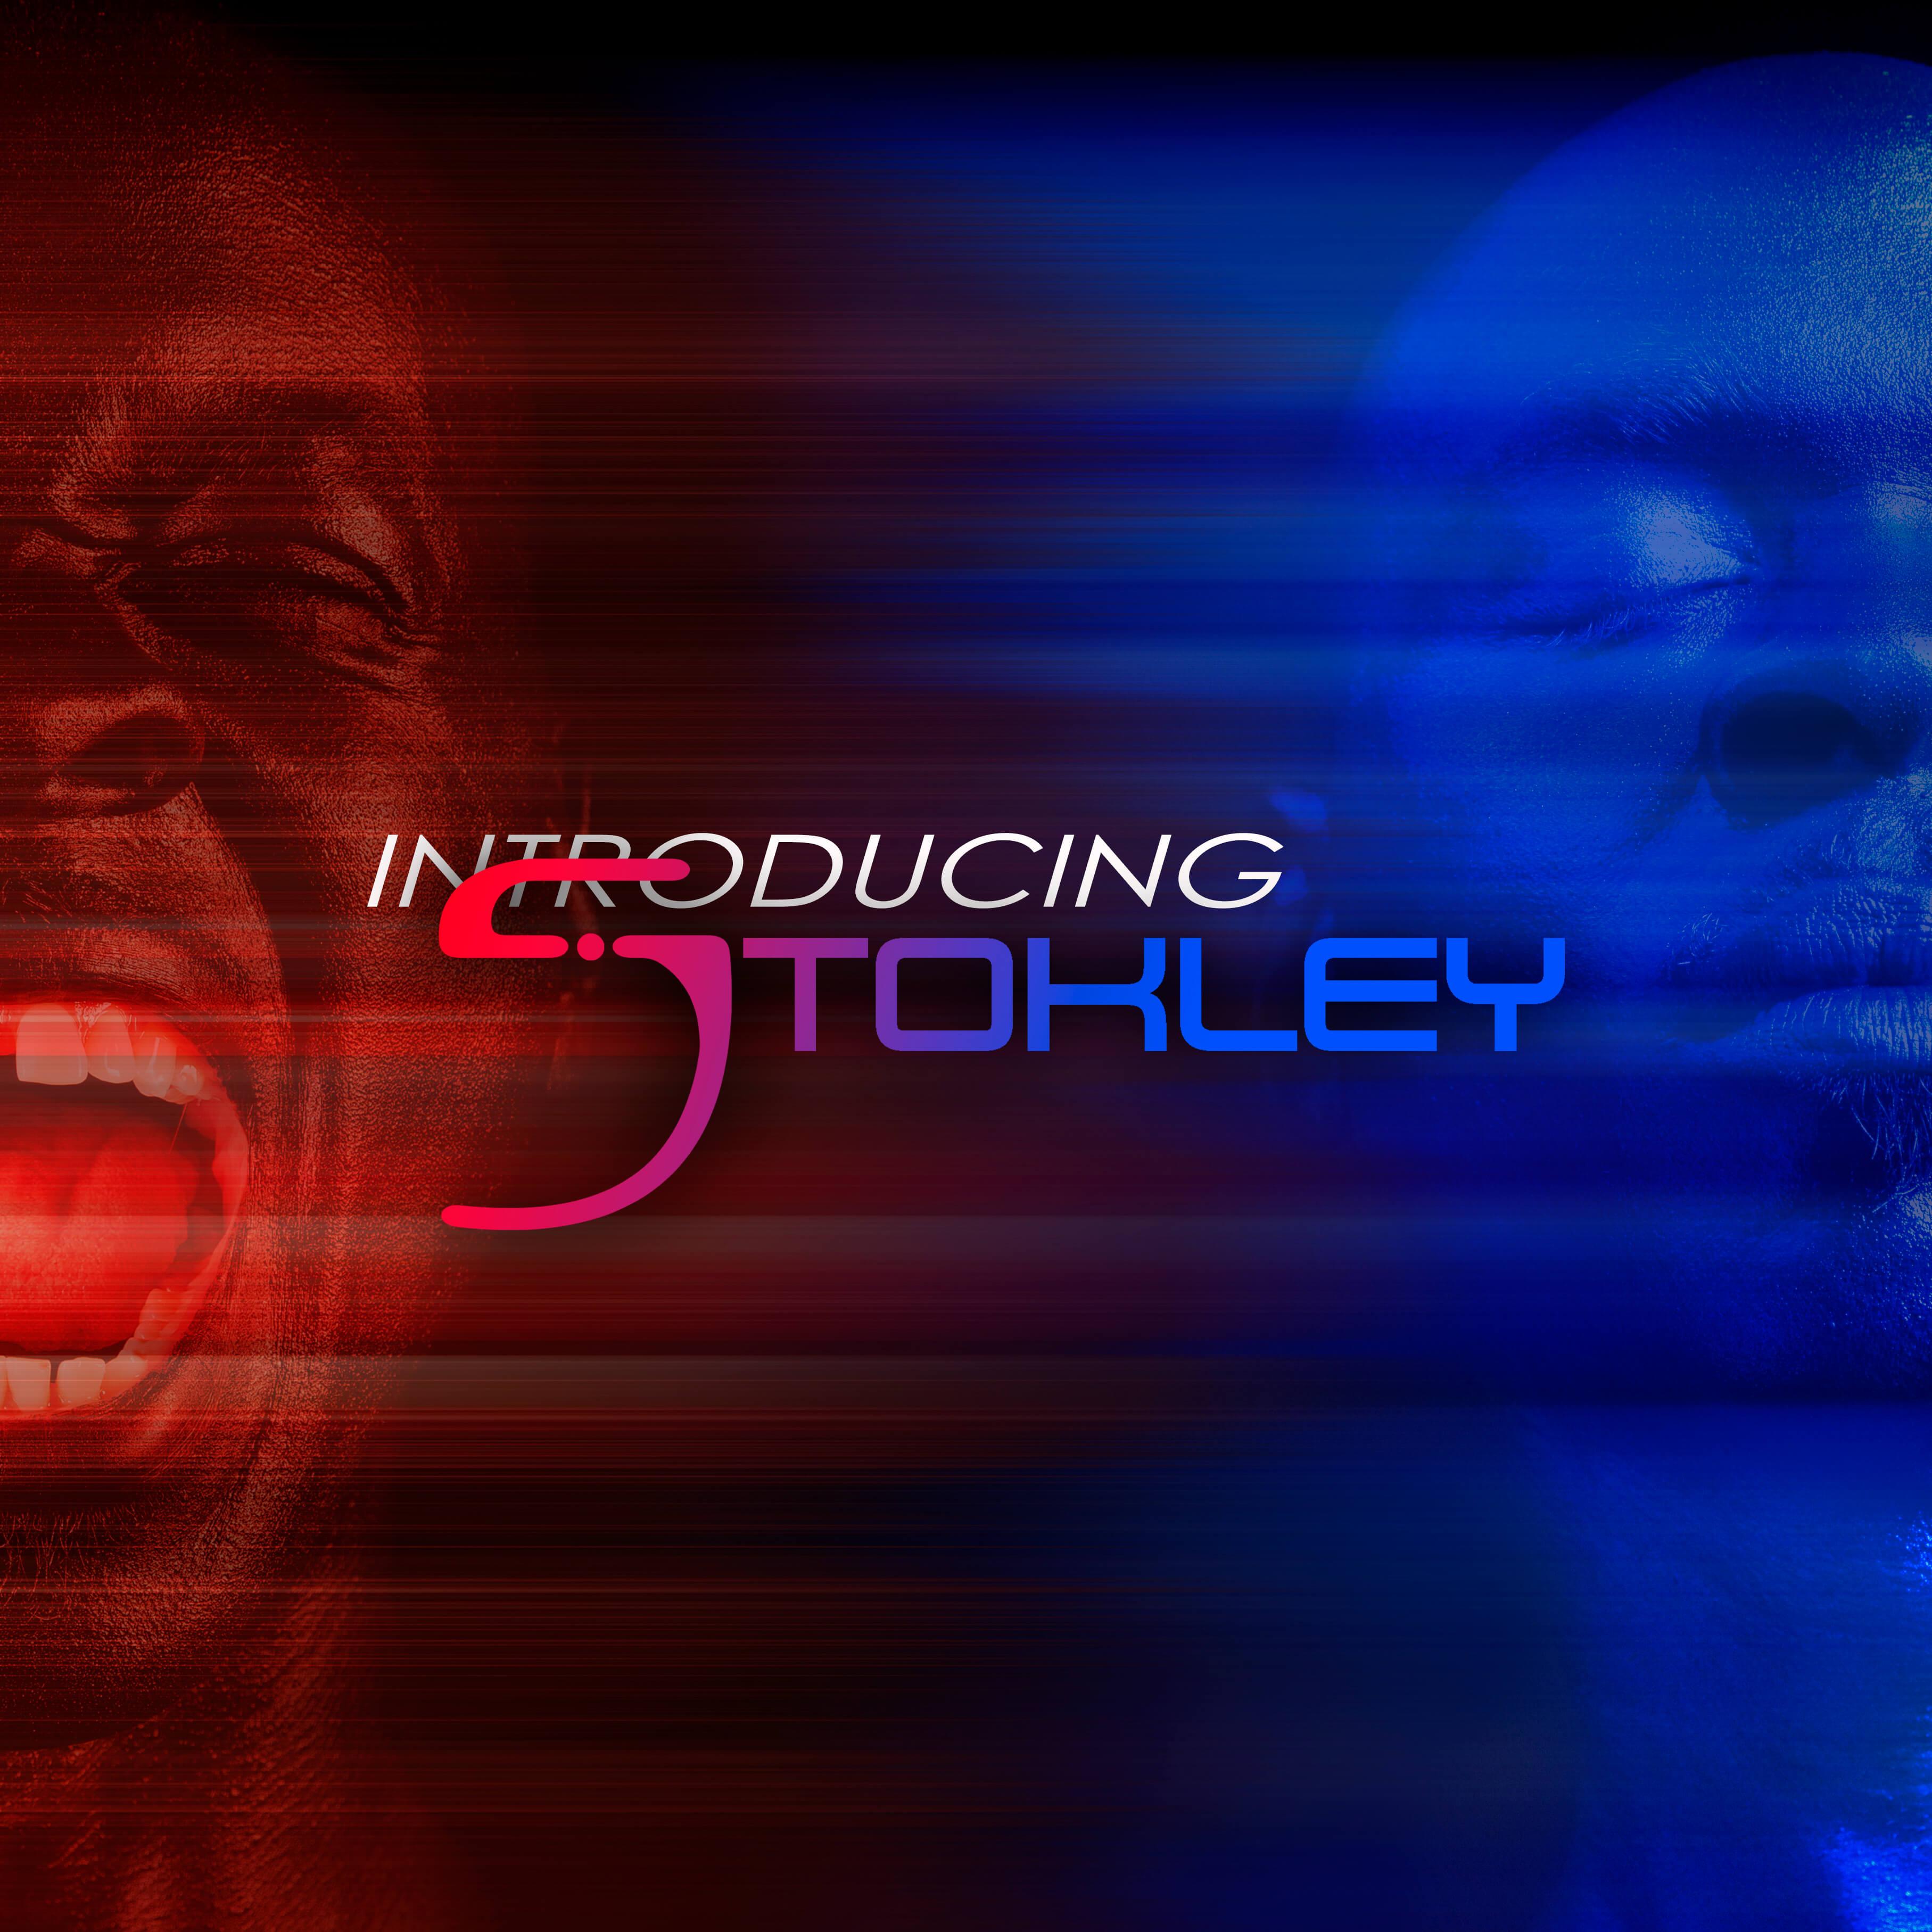 Stokley Introducing Stokley